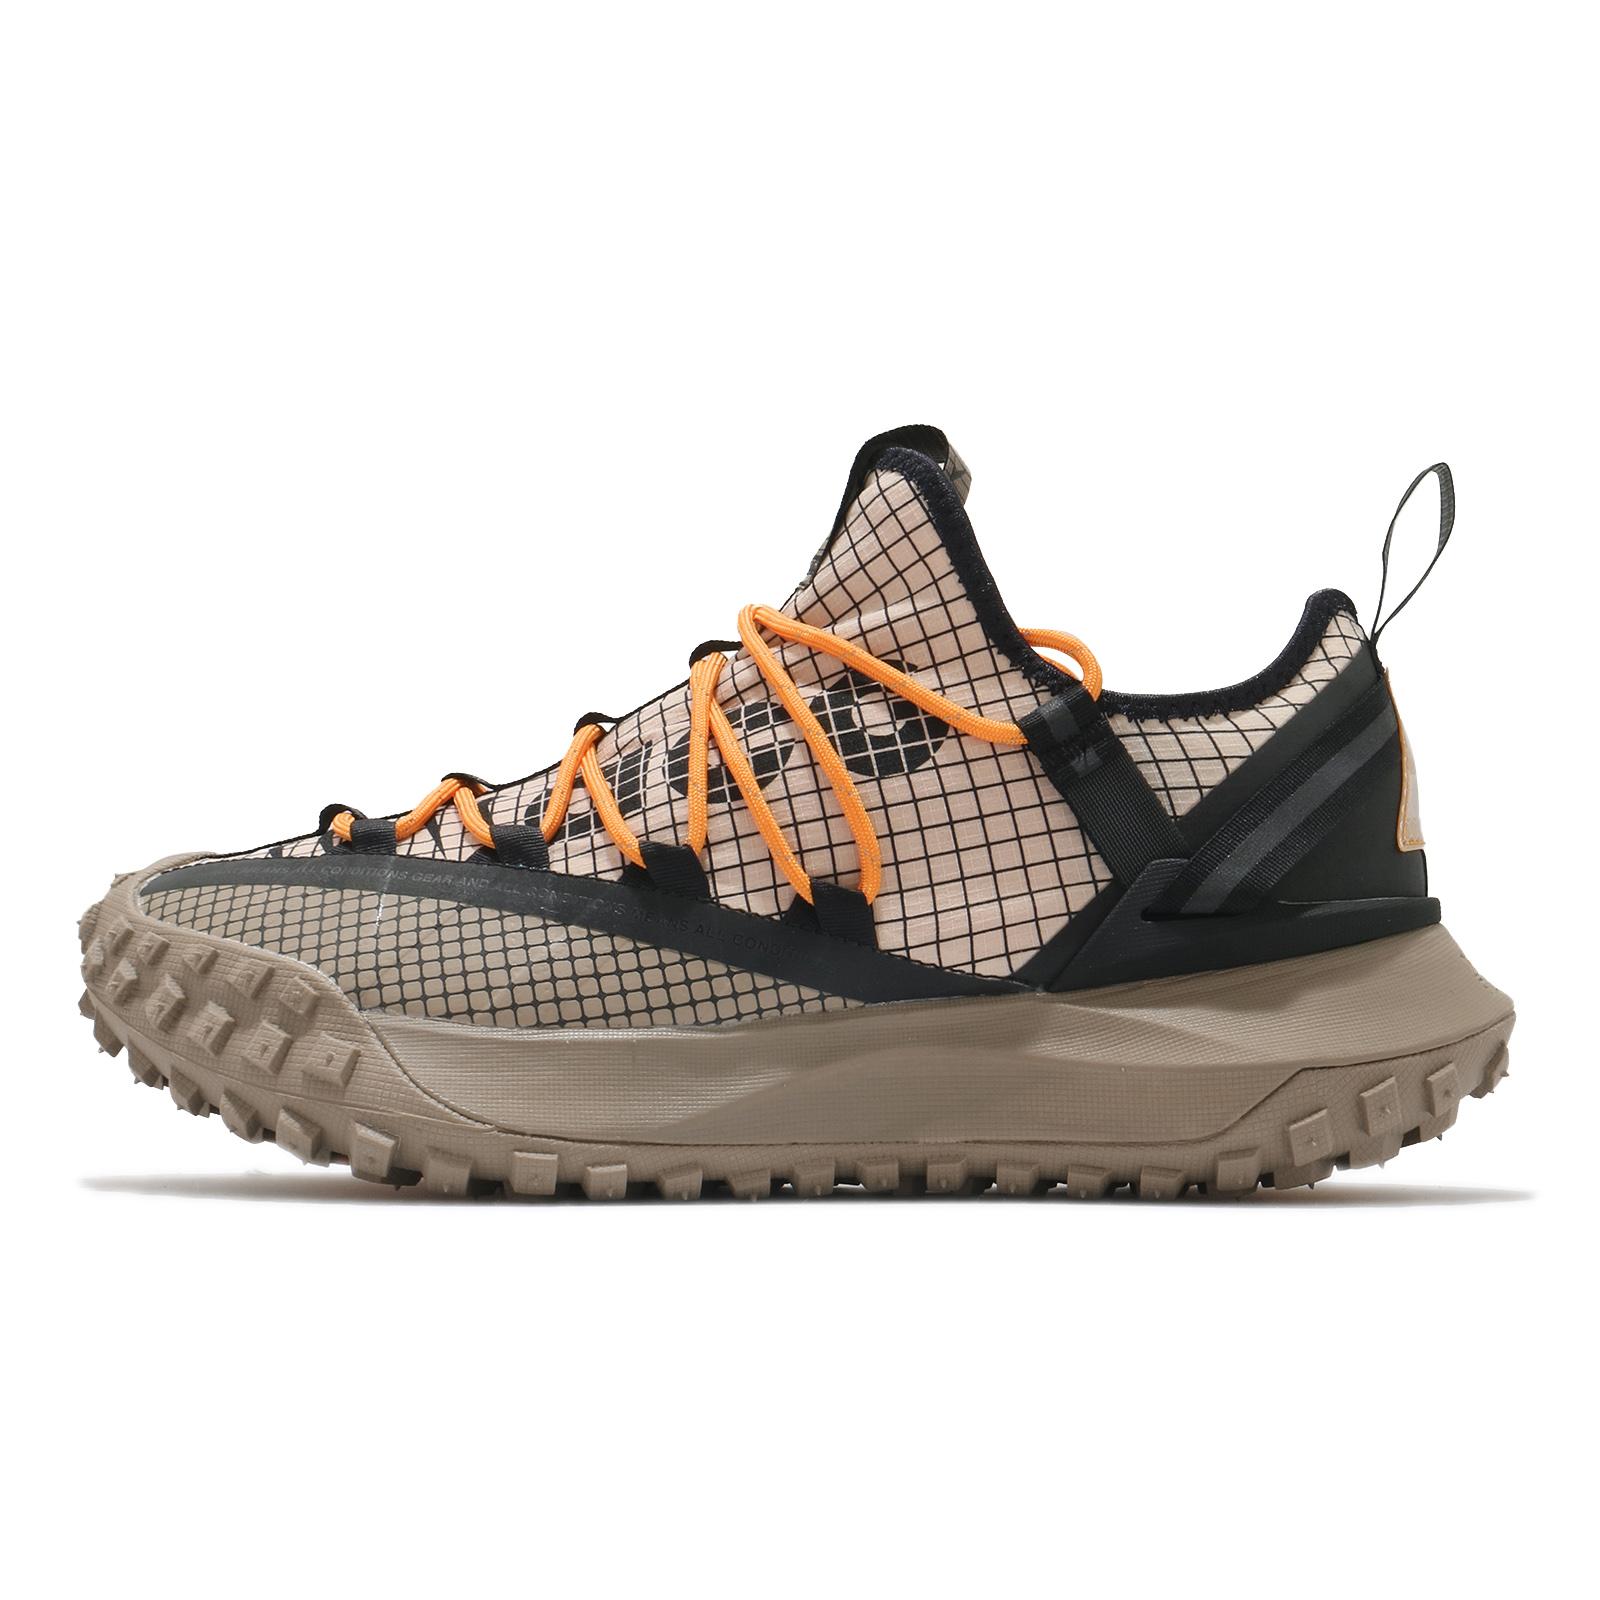 Nike ACG Mountain Fly Low 卡其 黑 男鞋 機能設計 戶外 【ACS】 DA5424-200